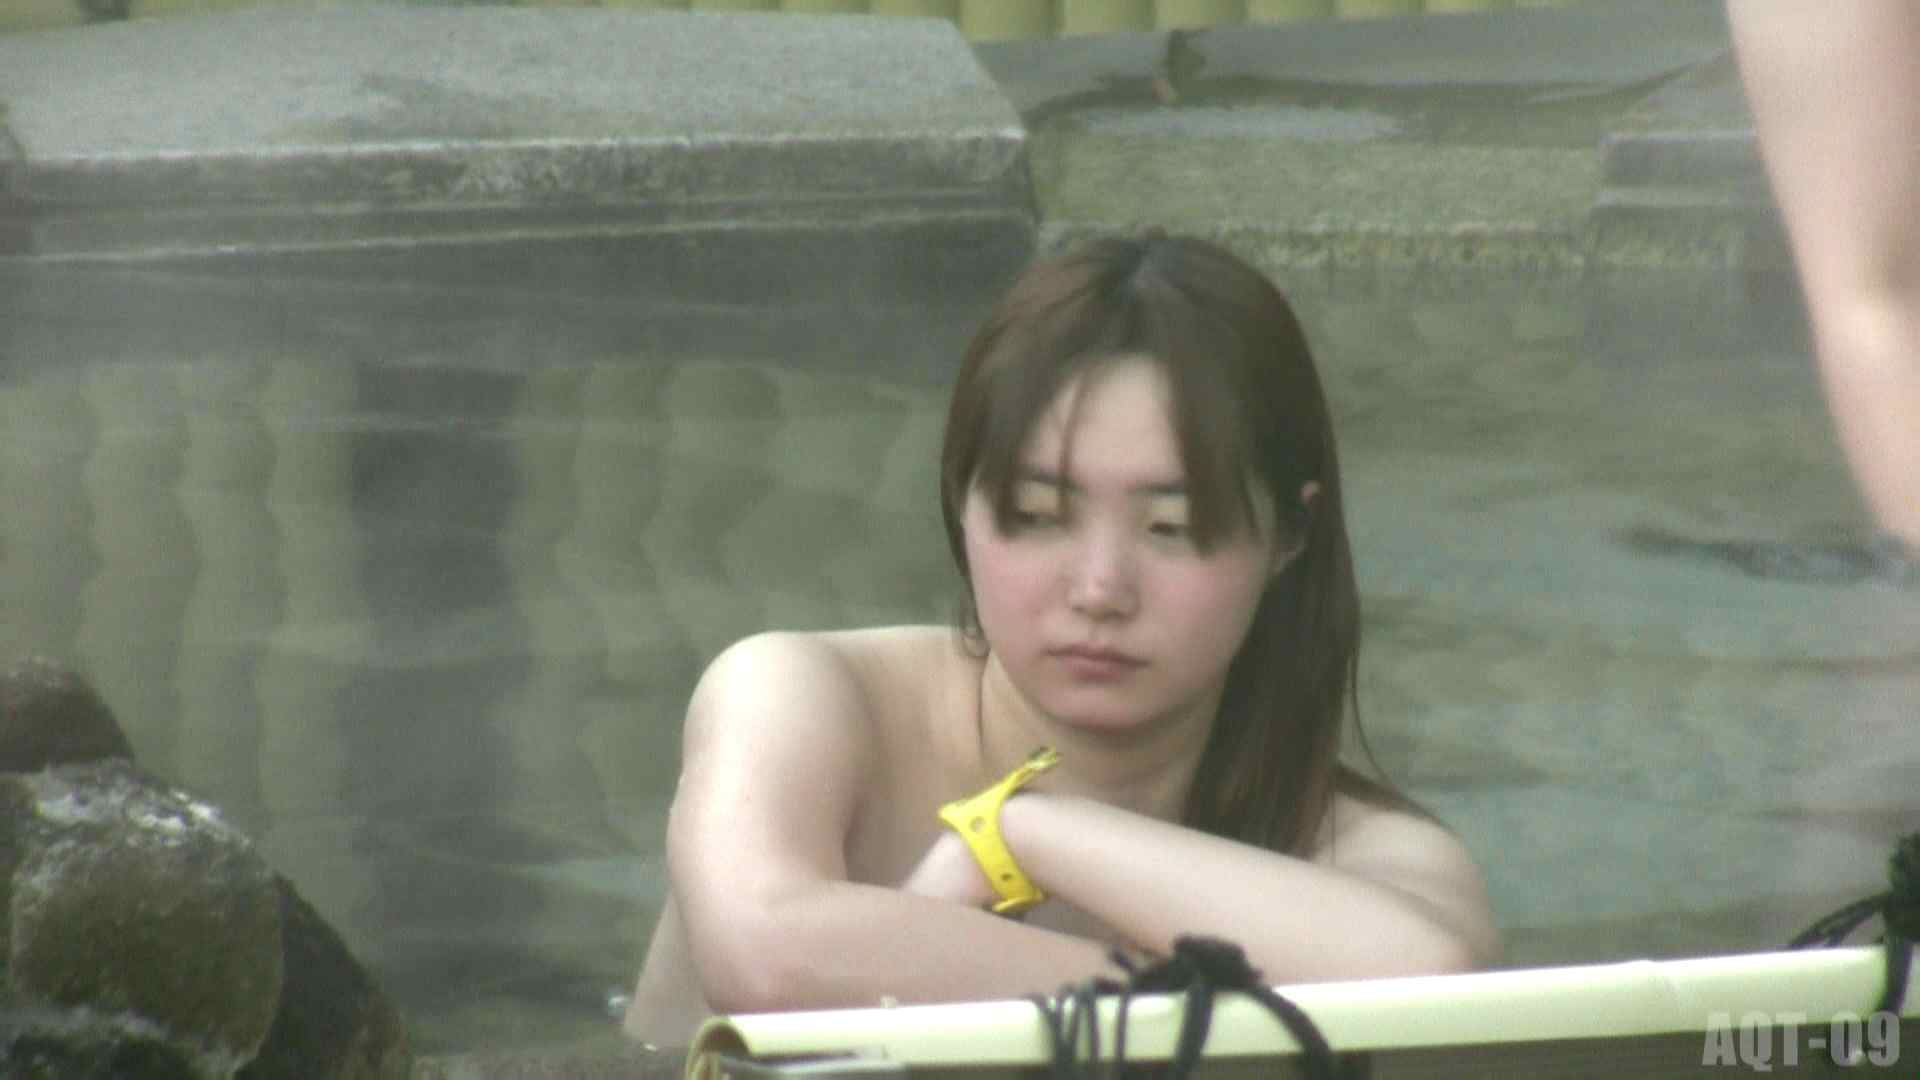 Aquaな露天風呂Vol.781 OLセックス 盗撮動画紹介 110画像 86